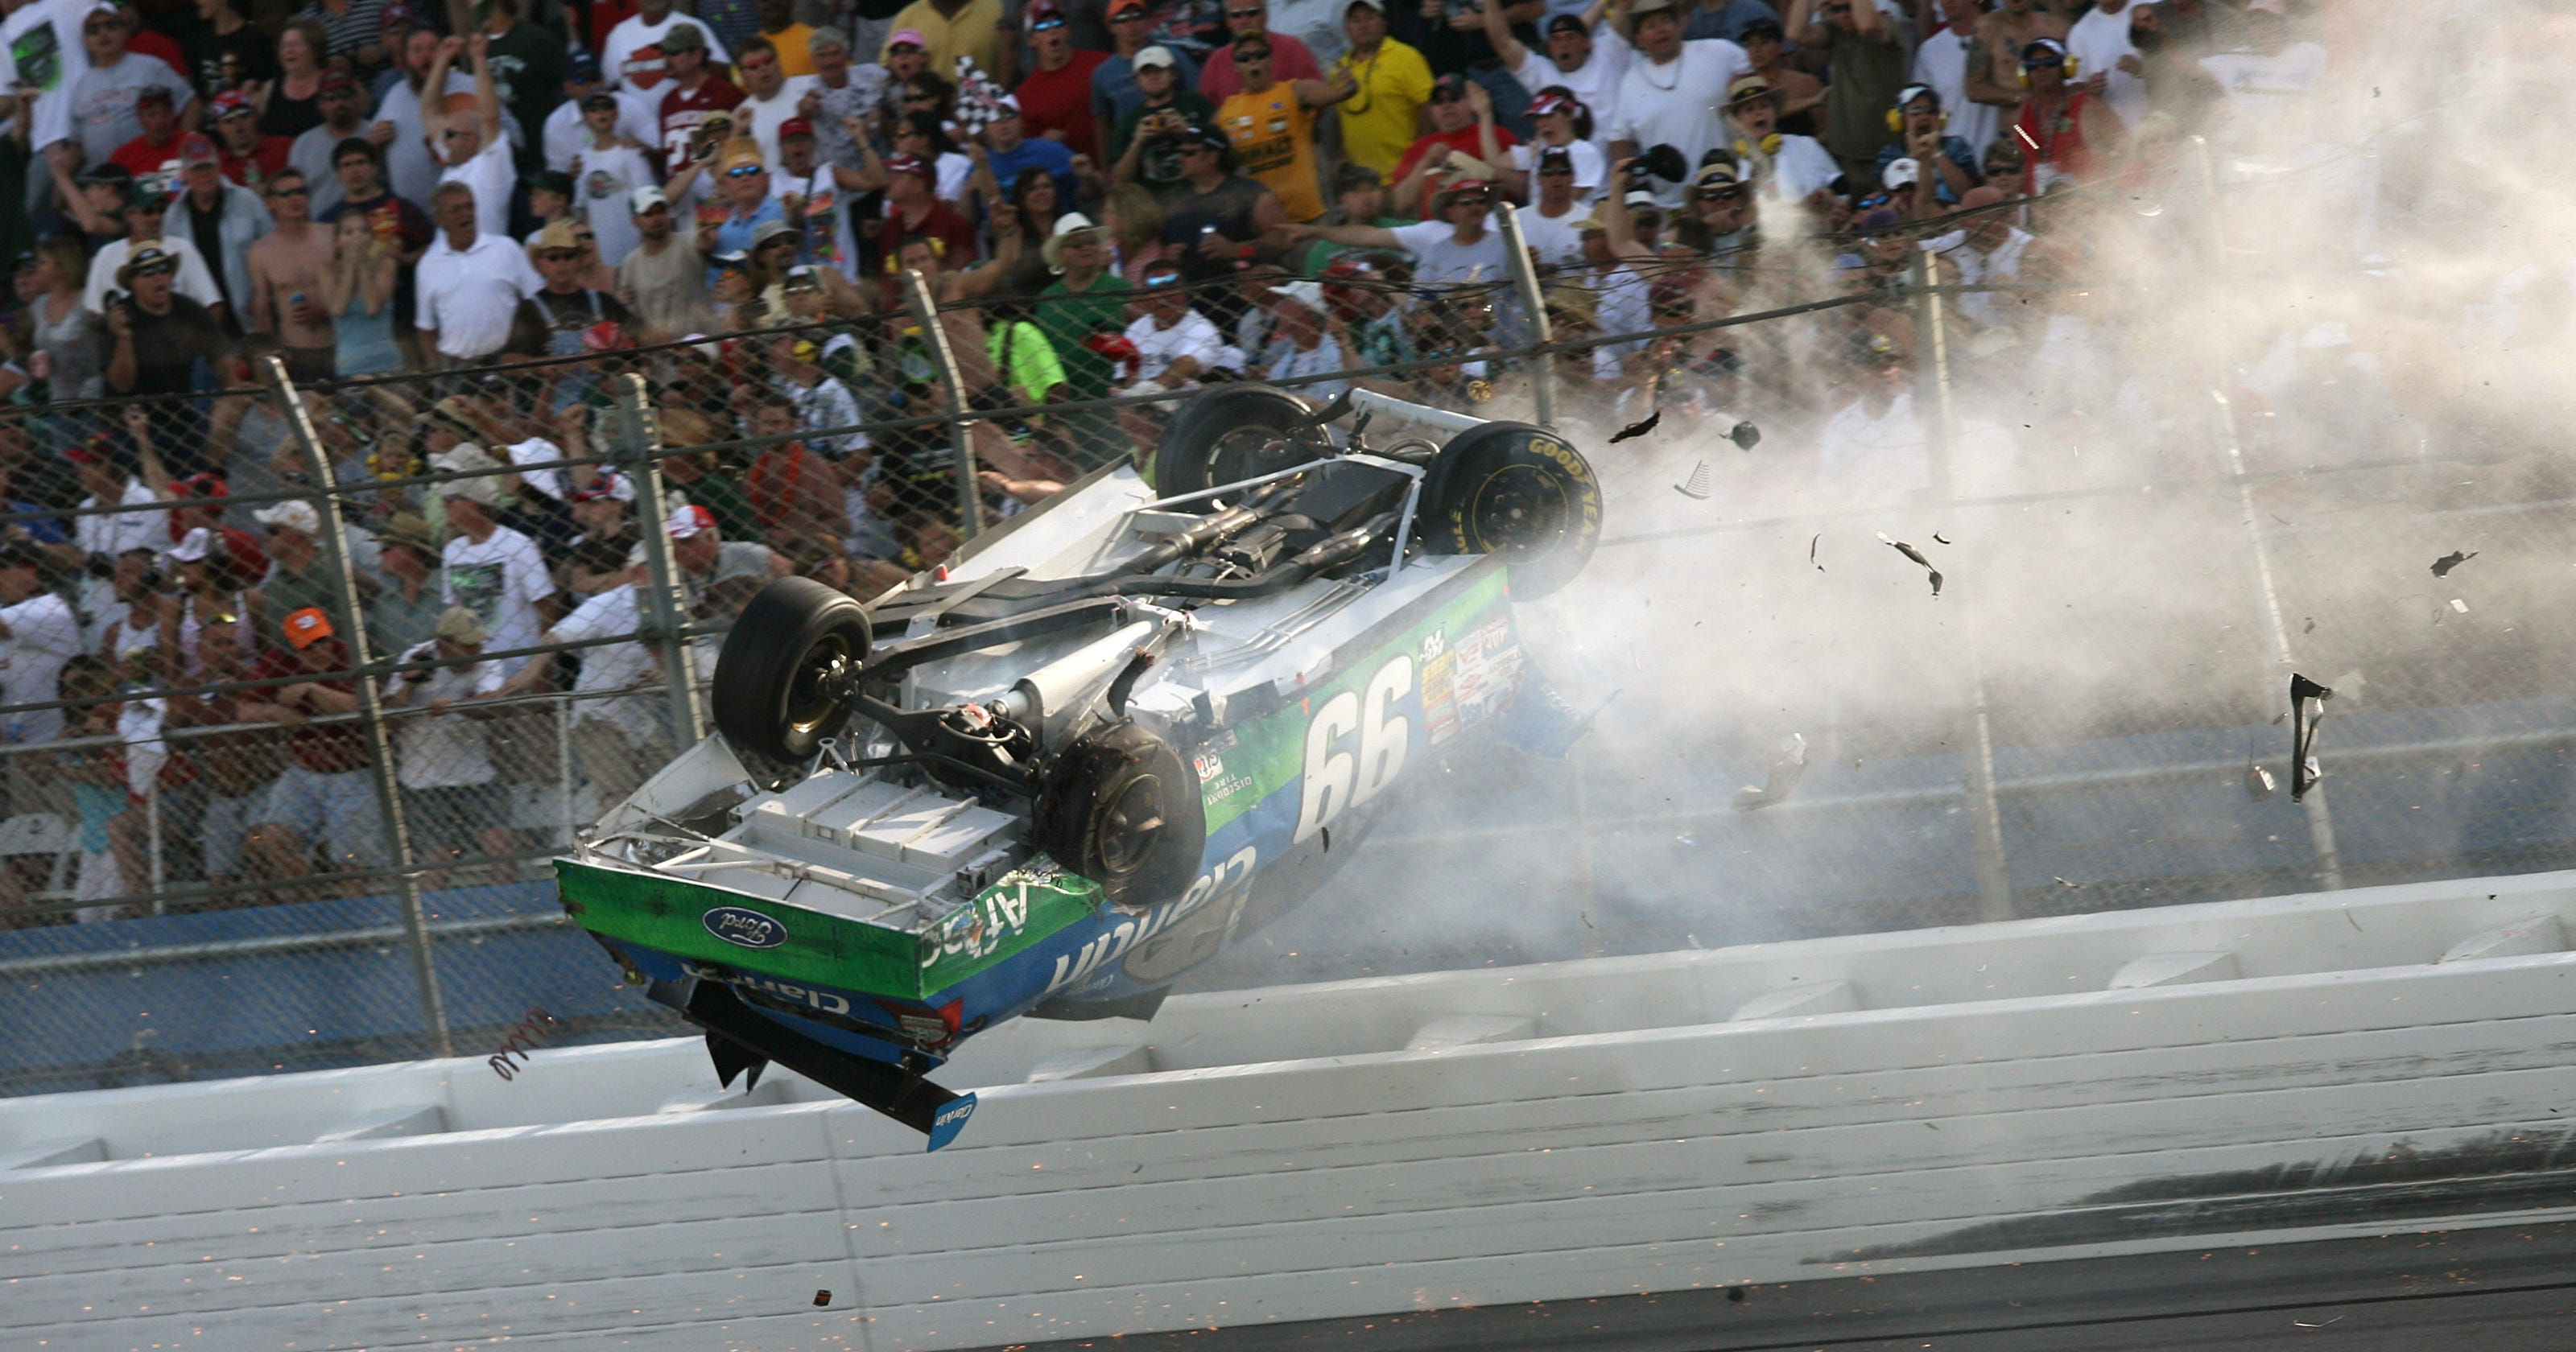 Talladega Edwards on Nascar Talladega 2013 Crash